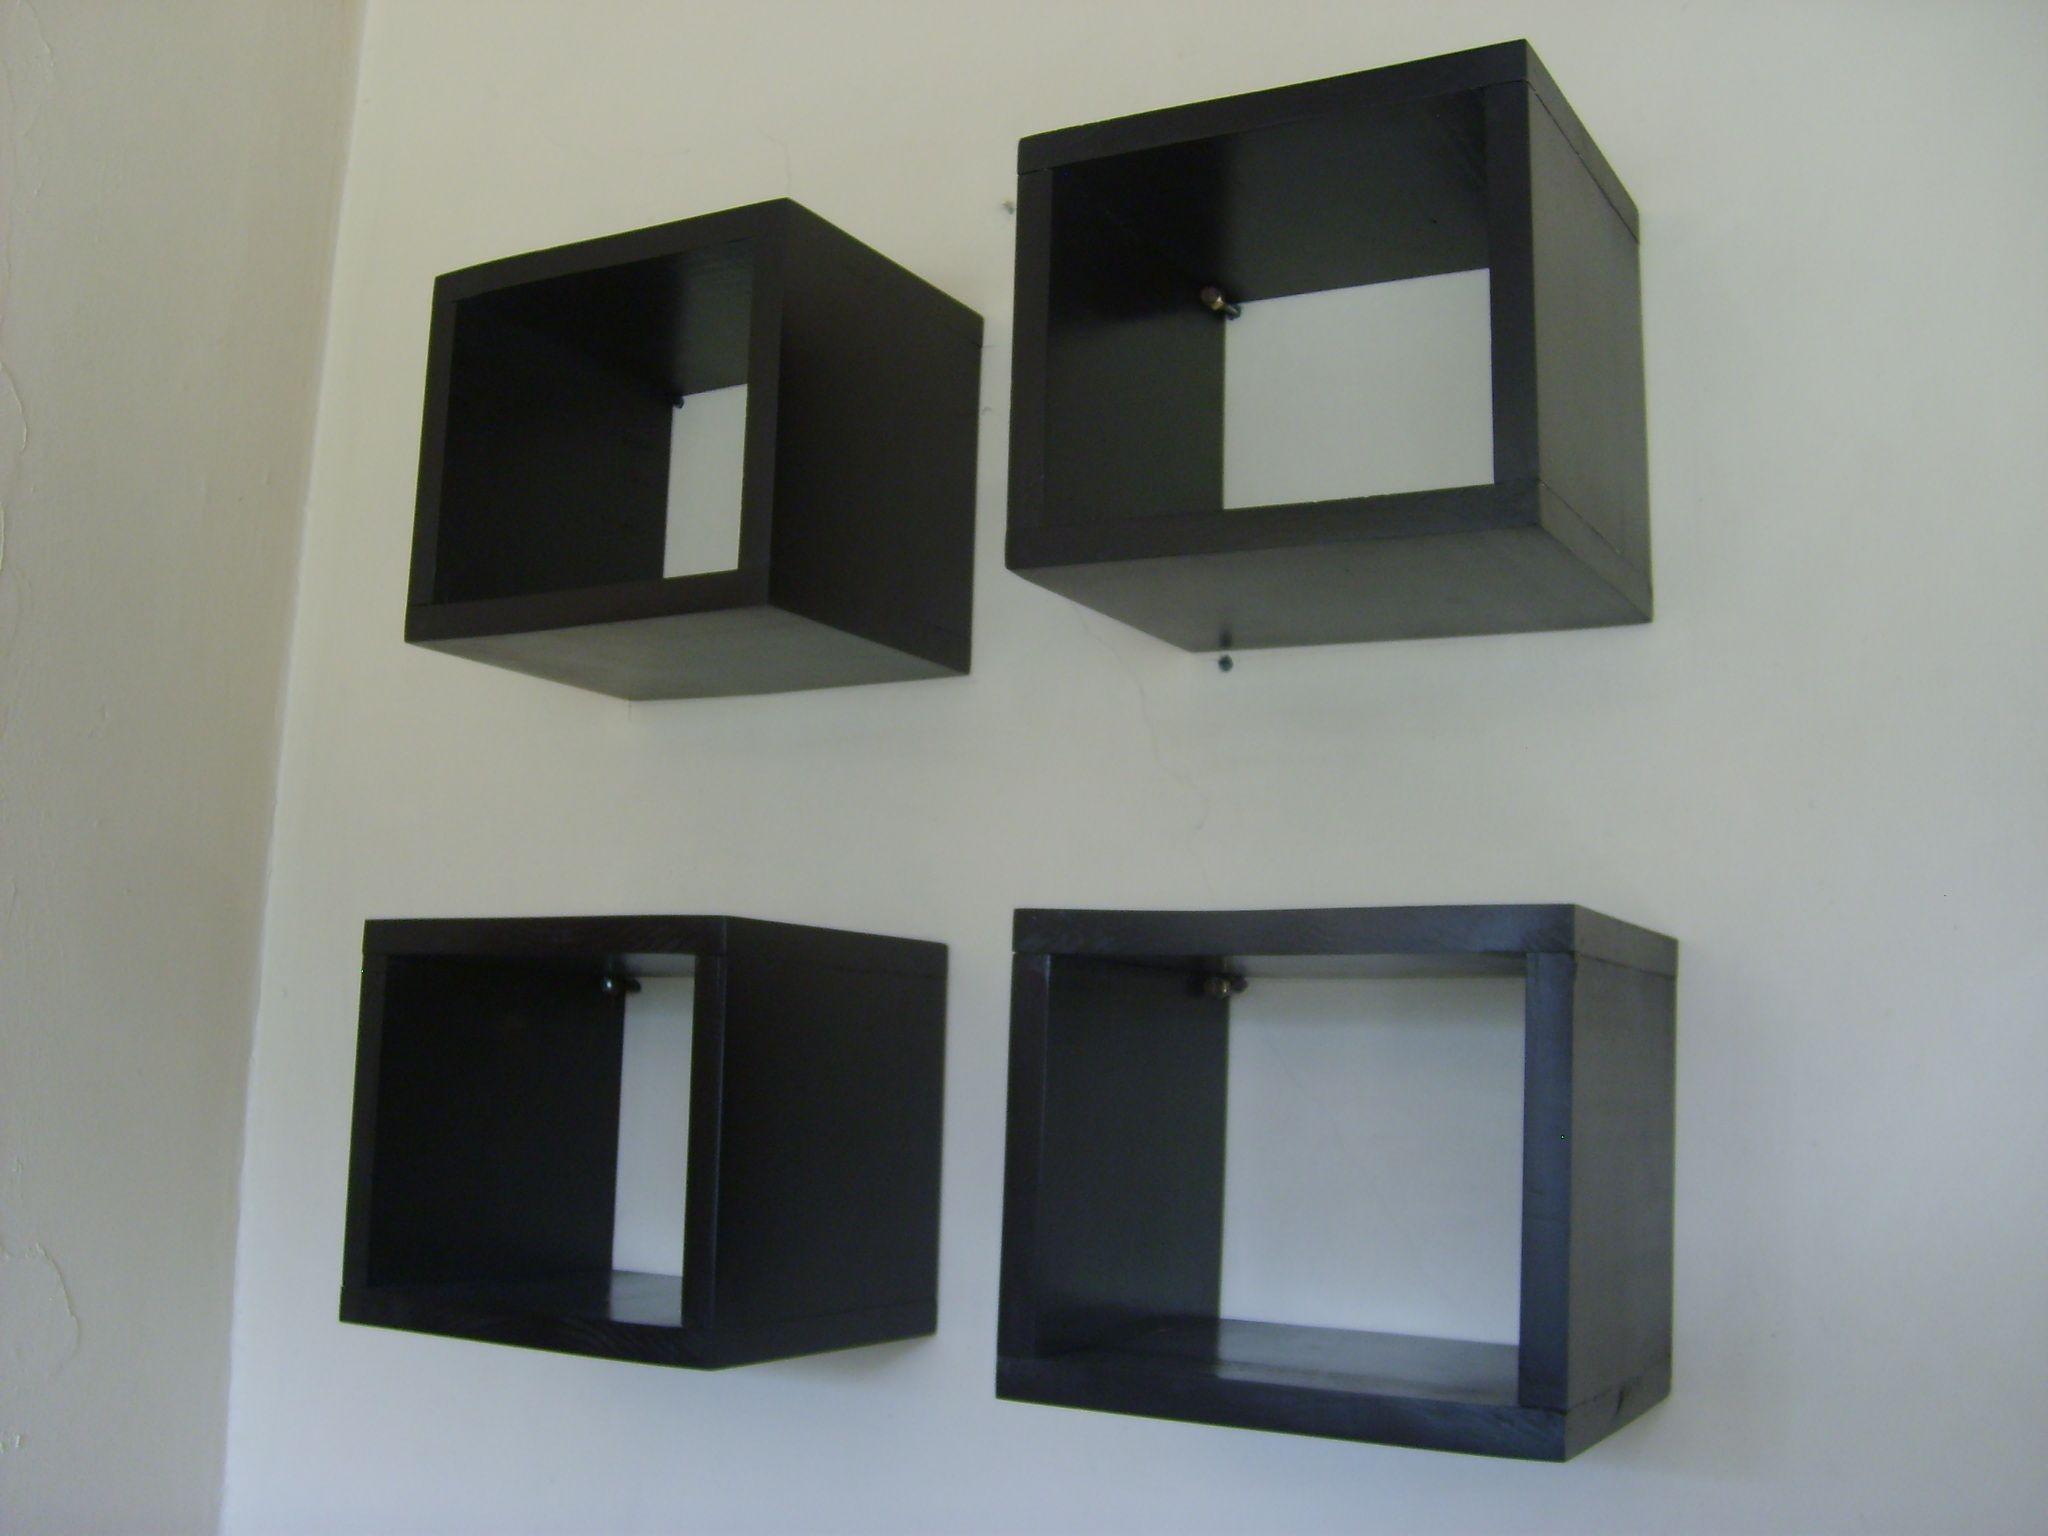 Repisas cubo modular.